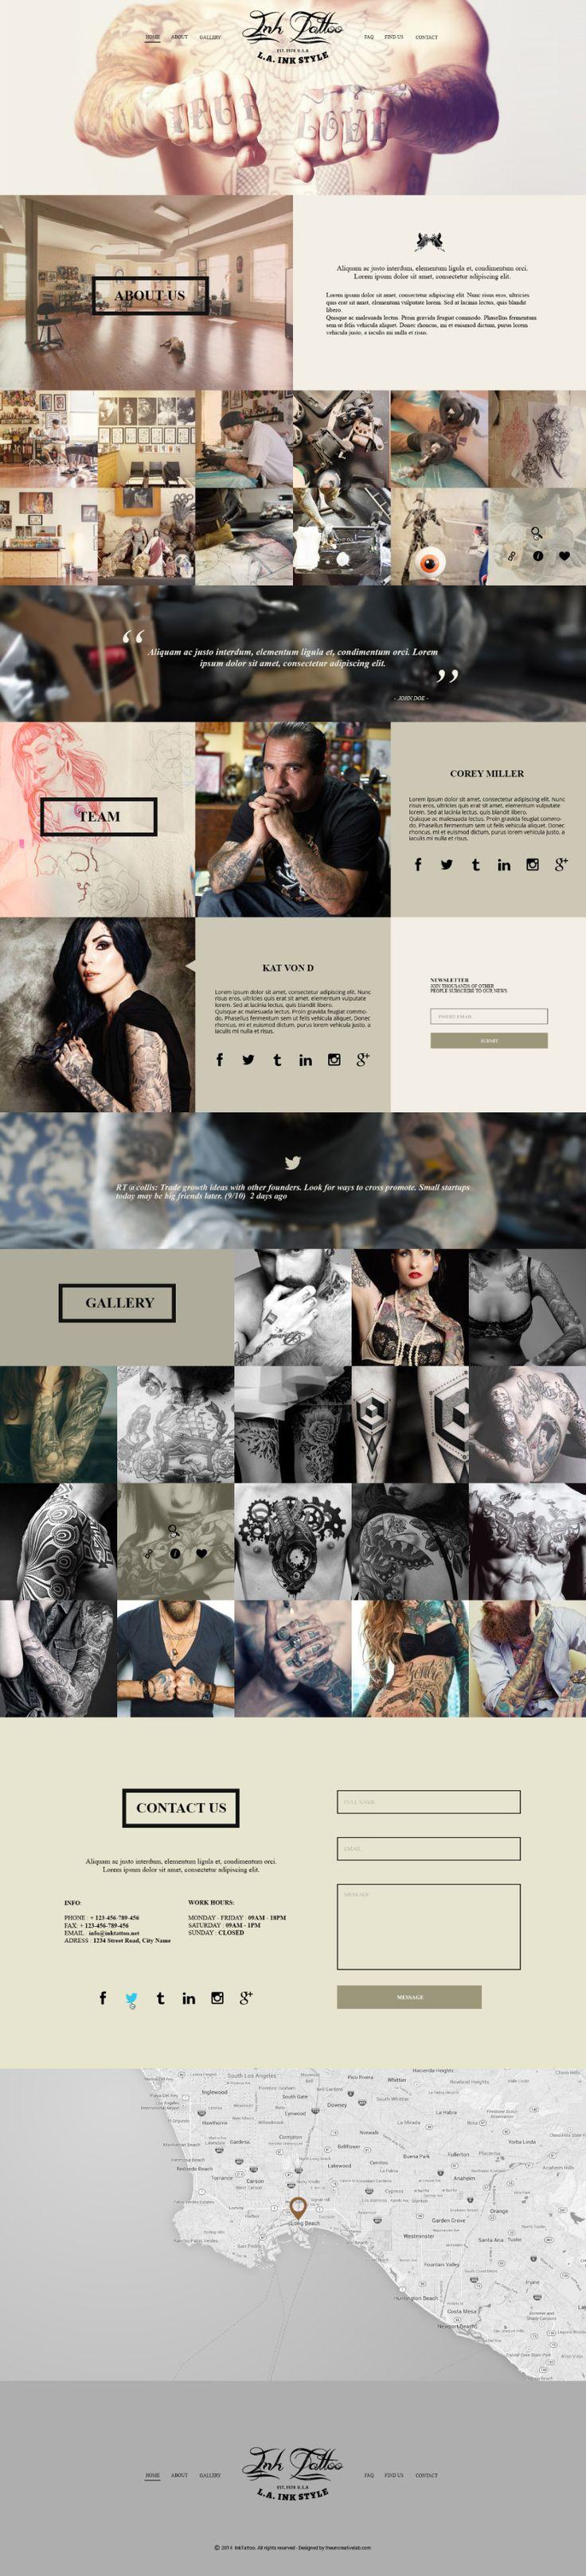 InkTattoo - Free PSD Tattoo site mockupLepix.org – Design Resources + Inspiration